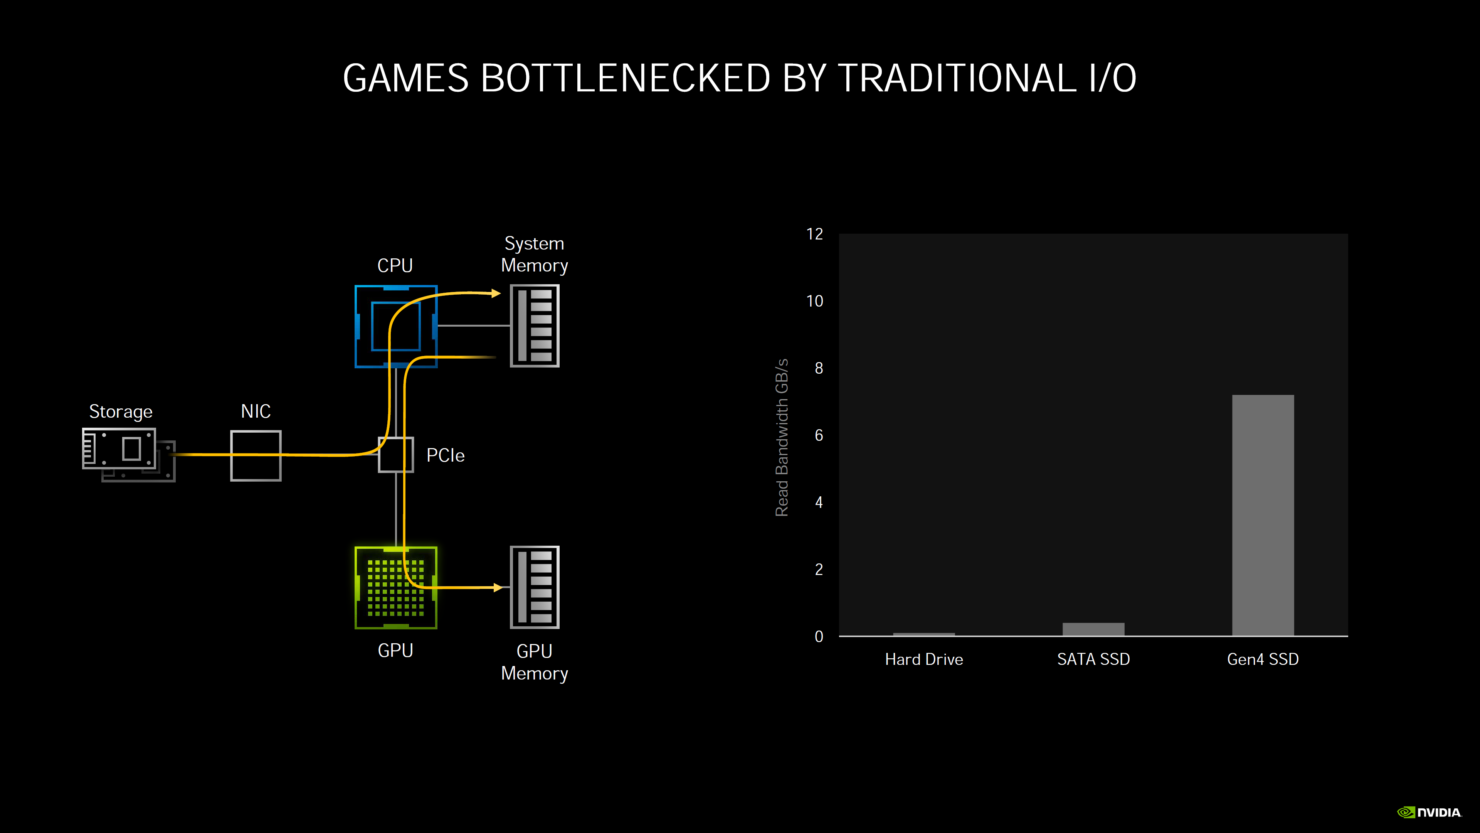 nvidia-geforce-rtx-30-series-deep-dive_rtx-3080_rtx-3090_rtx-3070_ampere-ga102_ampere-ga104_gpu_graphics-cards_35